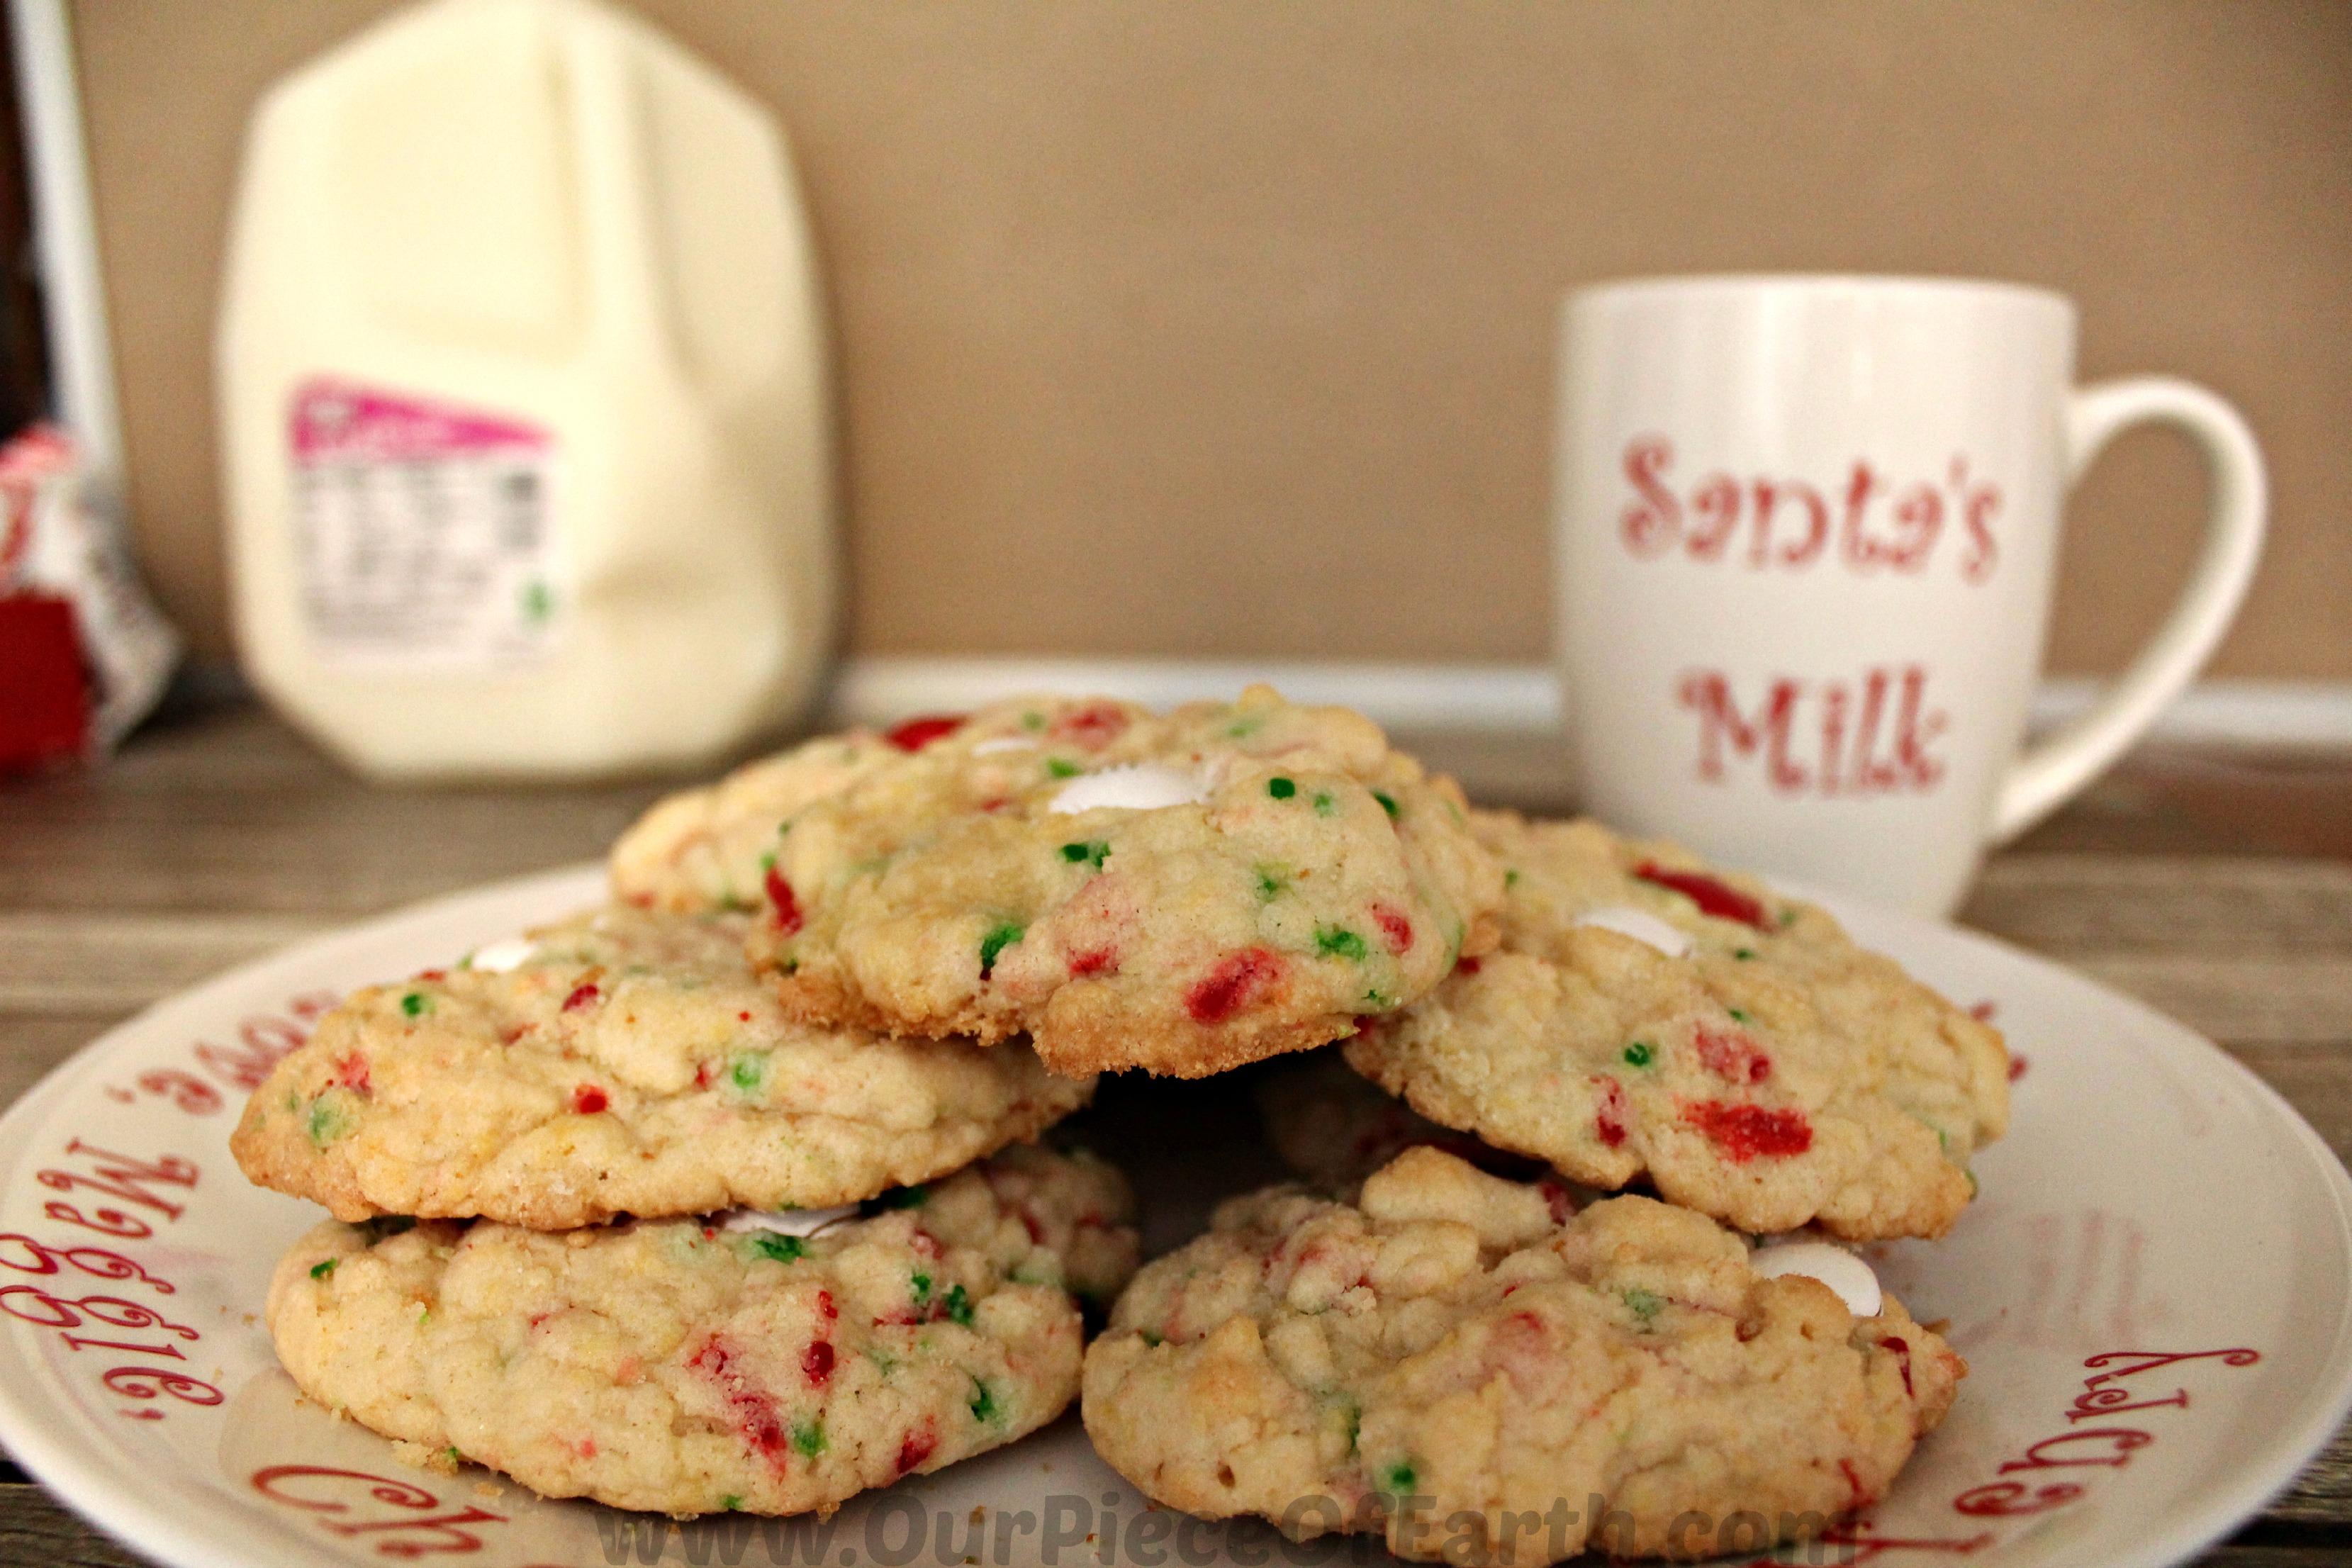 #BakeInTheFun How to make a personalized Santa plate and mug